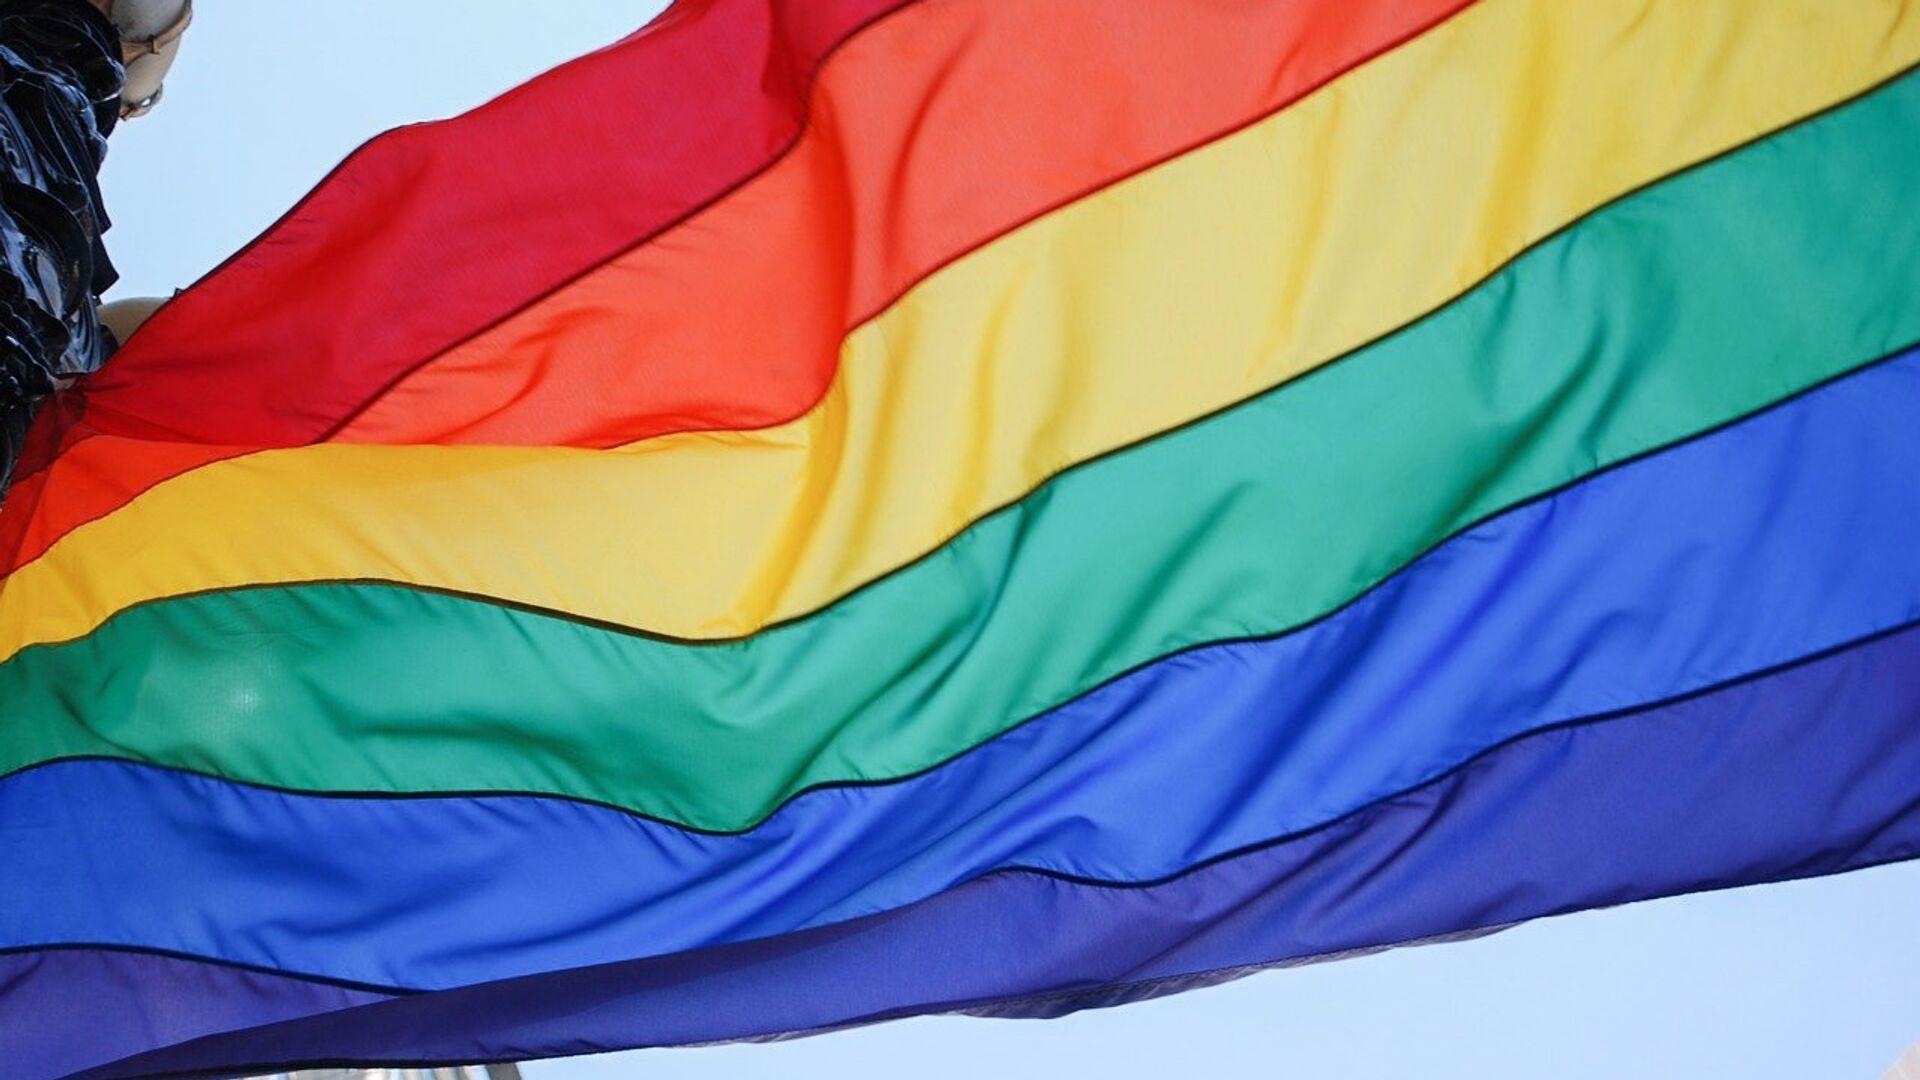 Bandera arcoíris, símbolo del movimiento LGBT - Sputnik Mundo, 1920, 18.05.2021